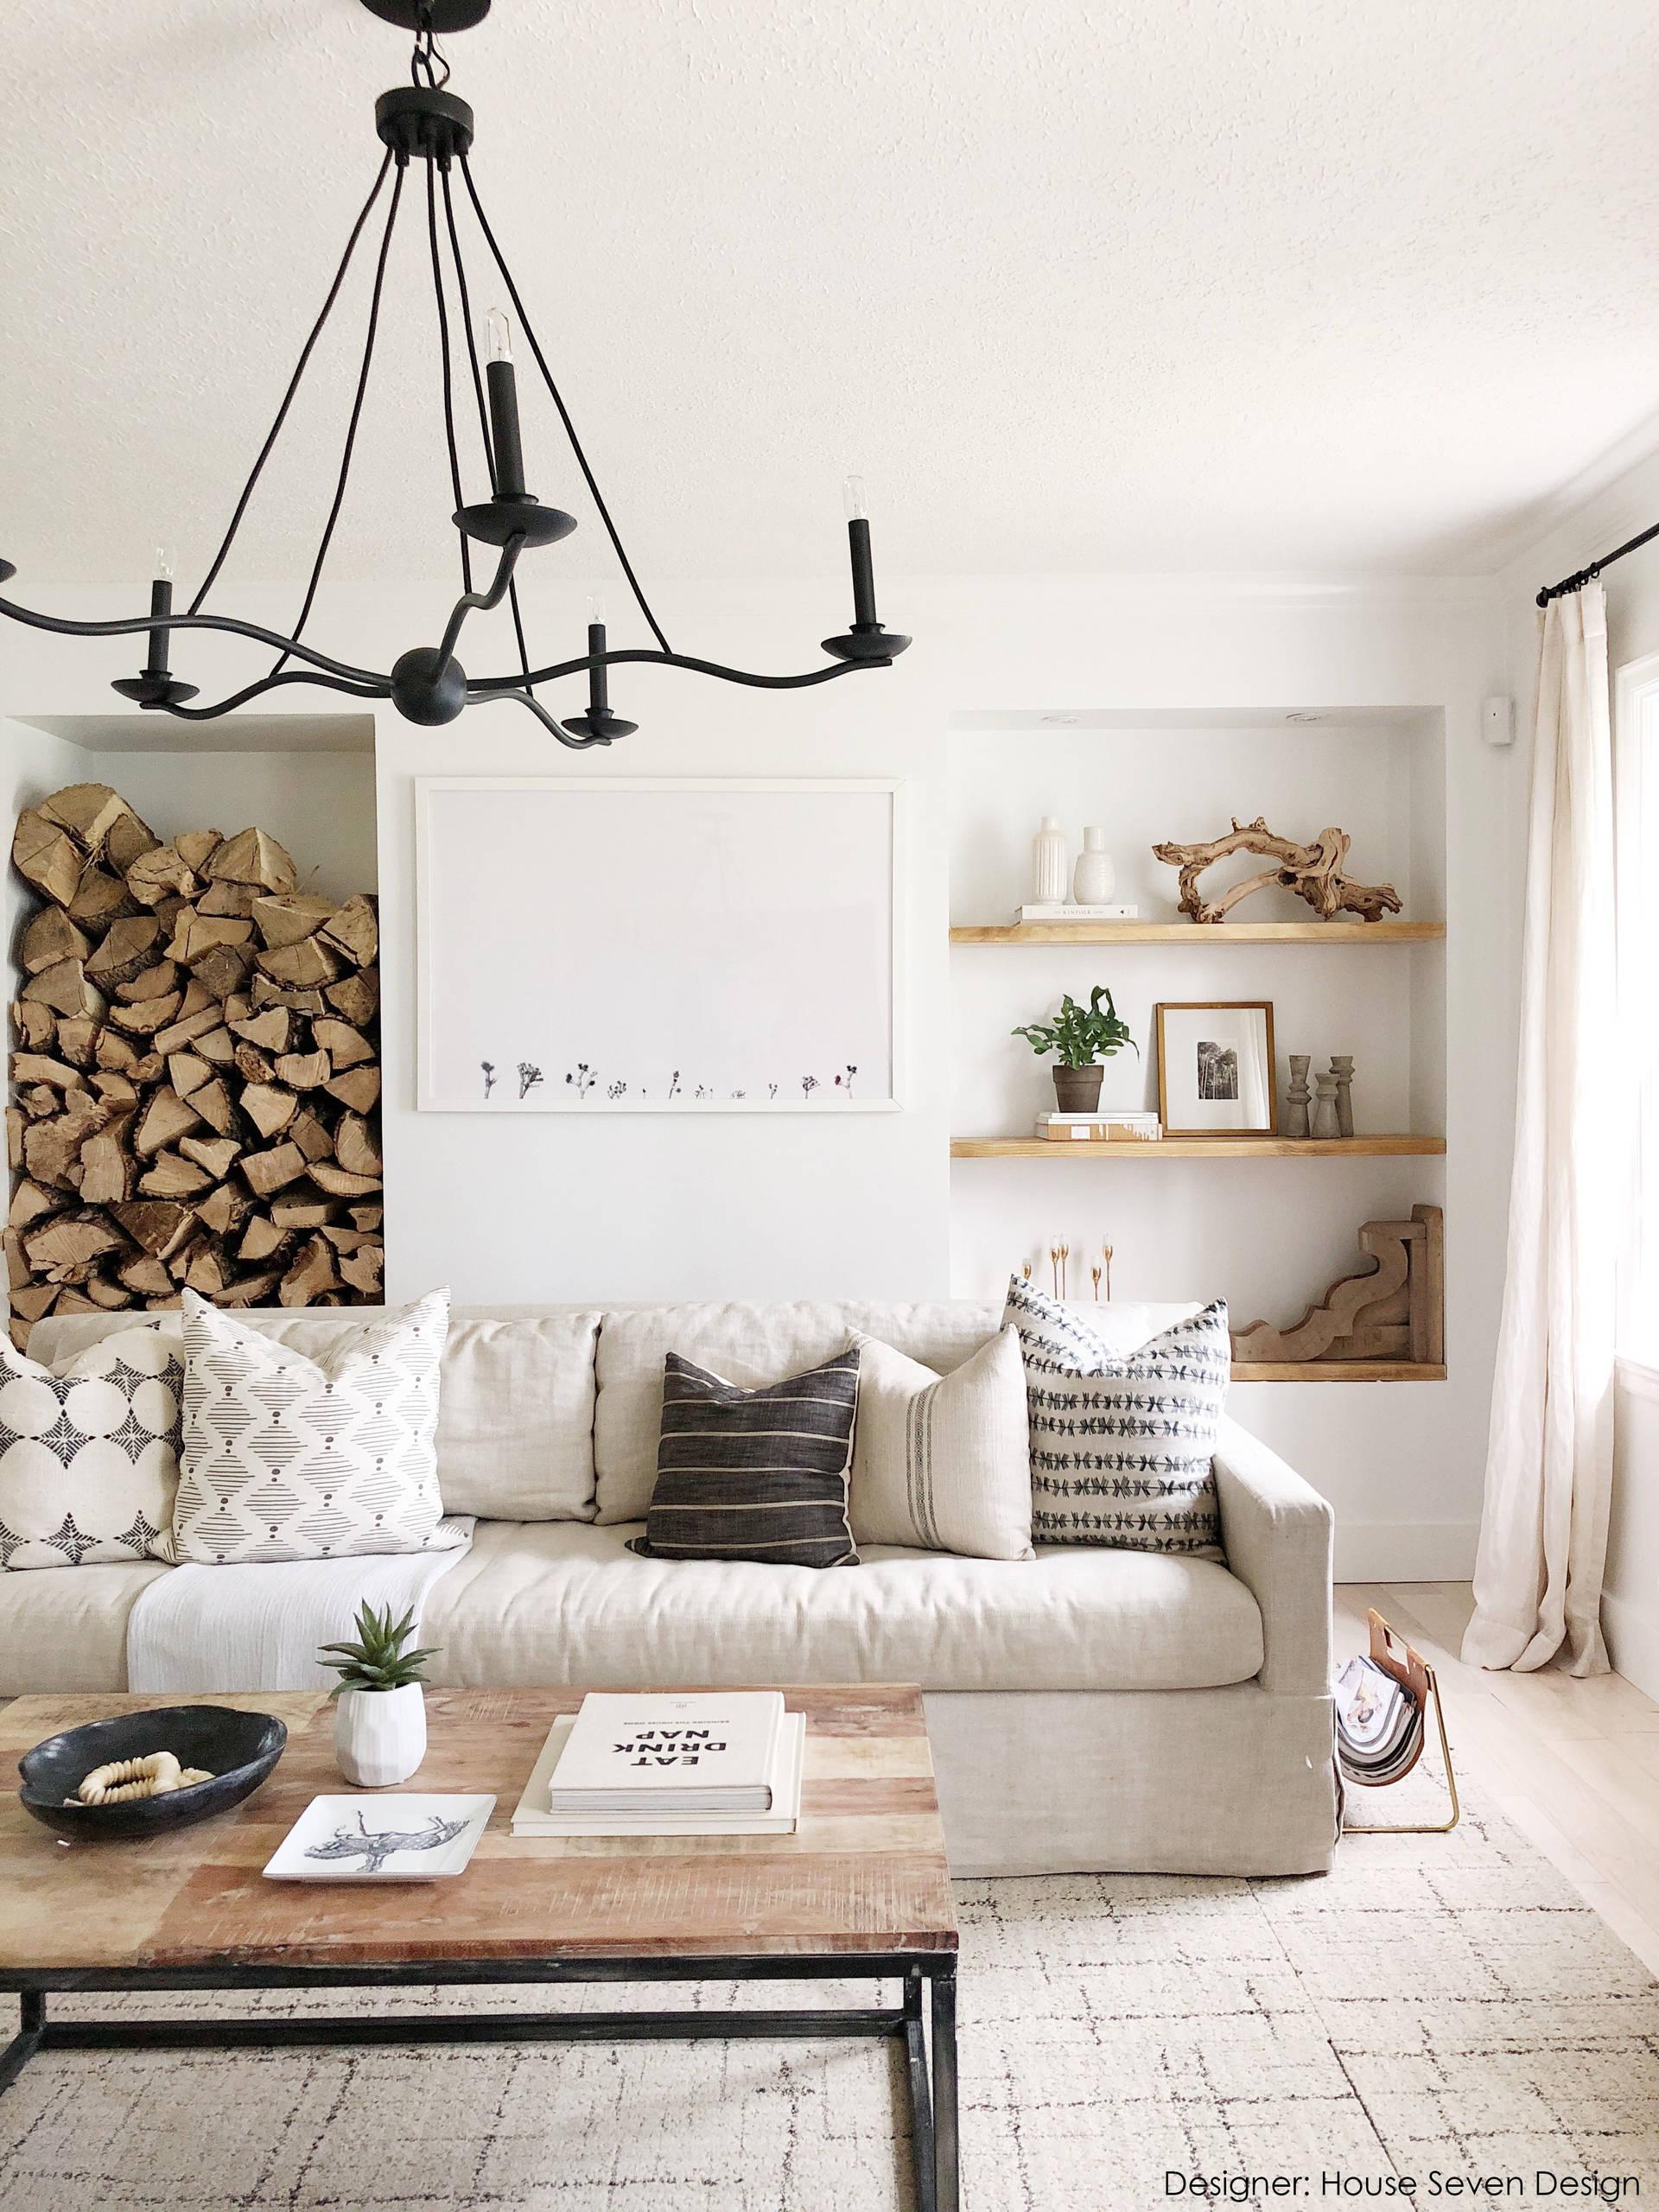 75 Beautiful Scandinavian Living Room Pictures Ideas February 2021 Houzz